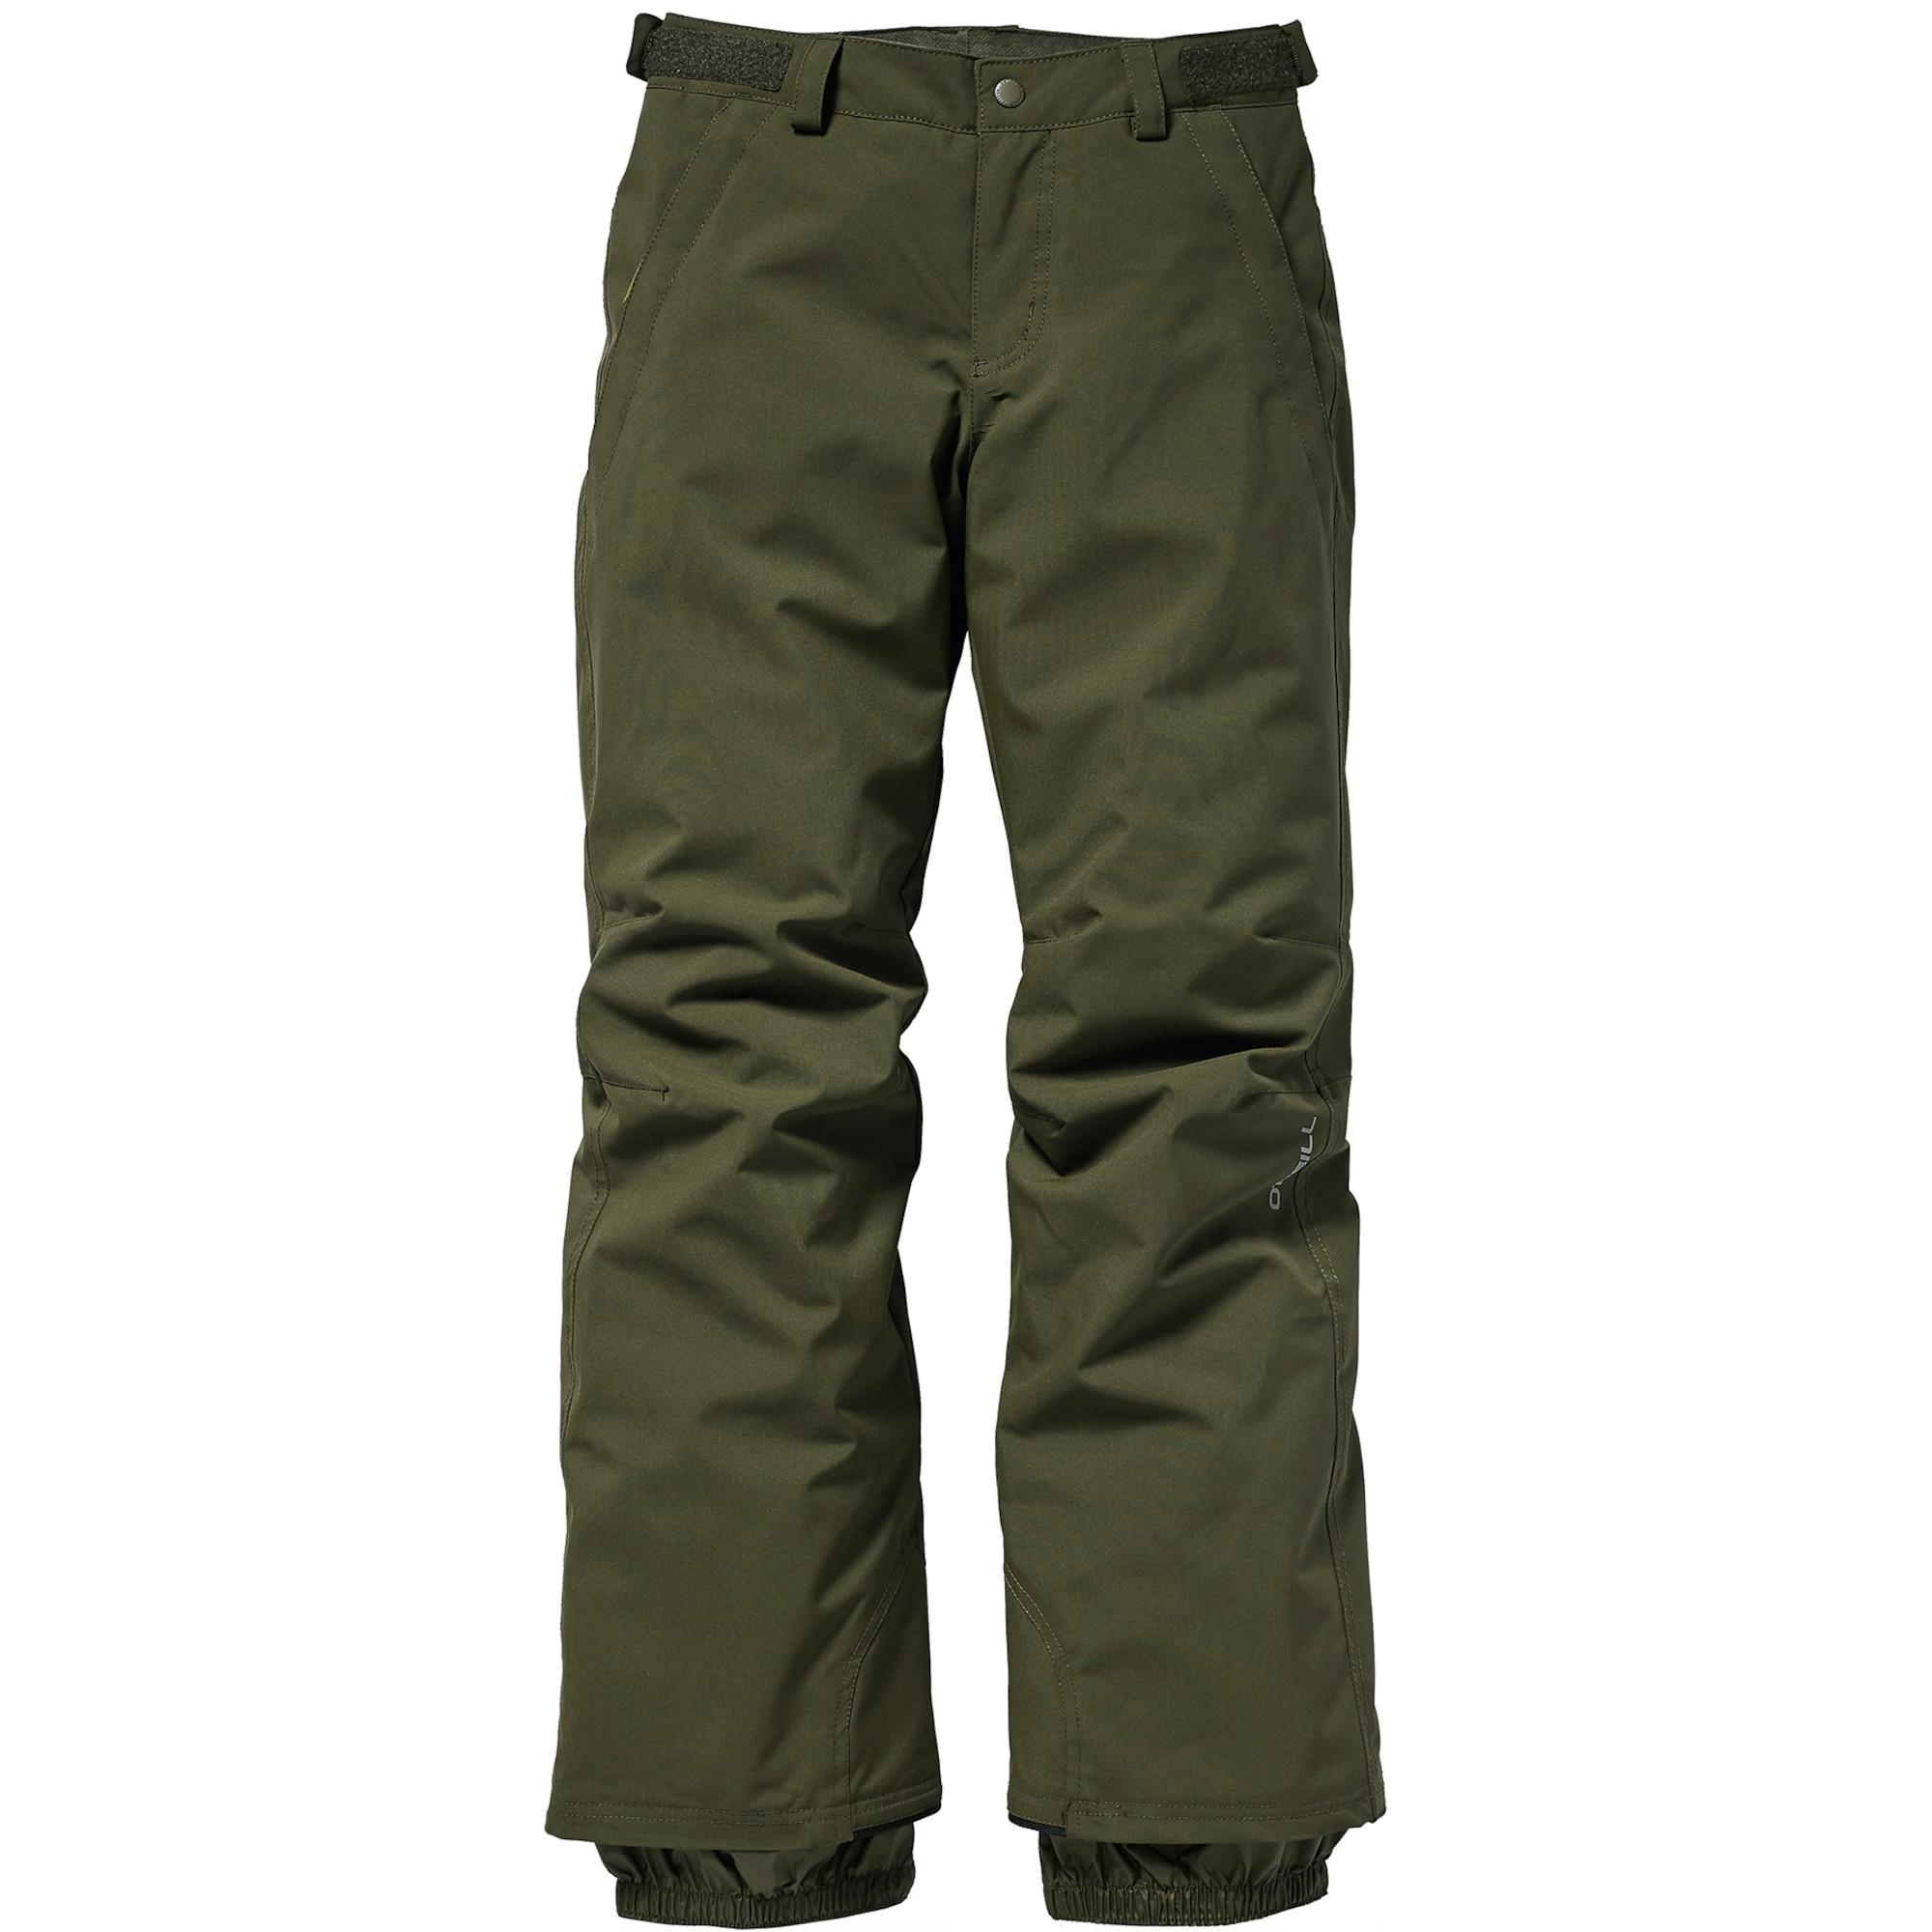 ONEILL Outodoor kalhoty PB ANVIL PANTS tmavě zelená O'NEILL